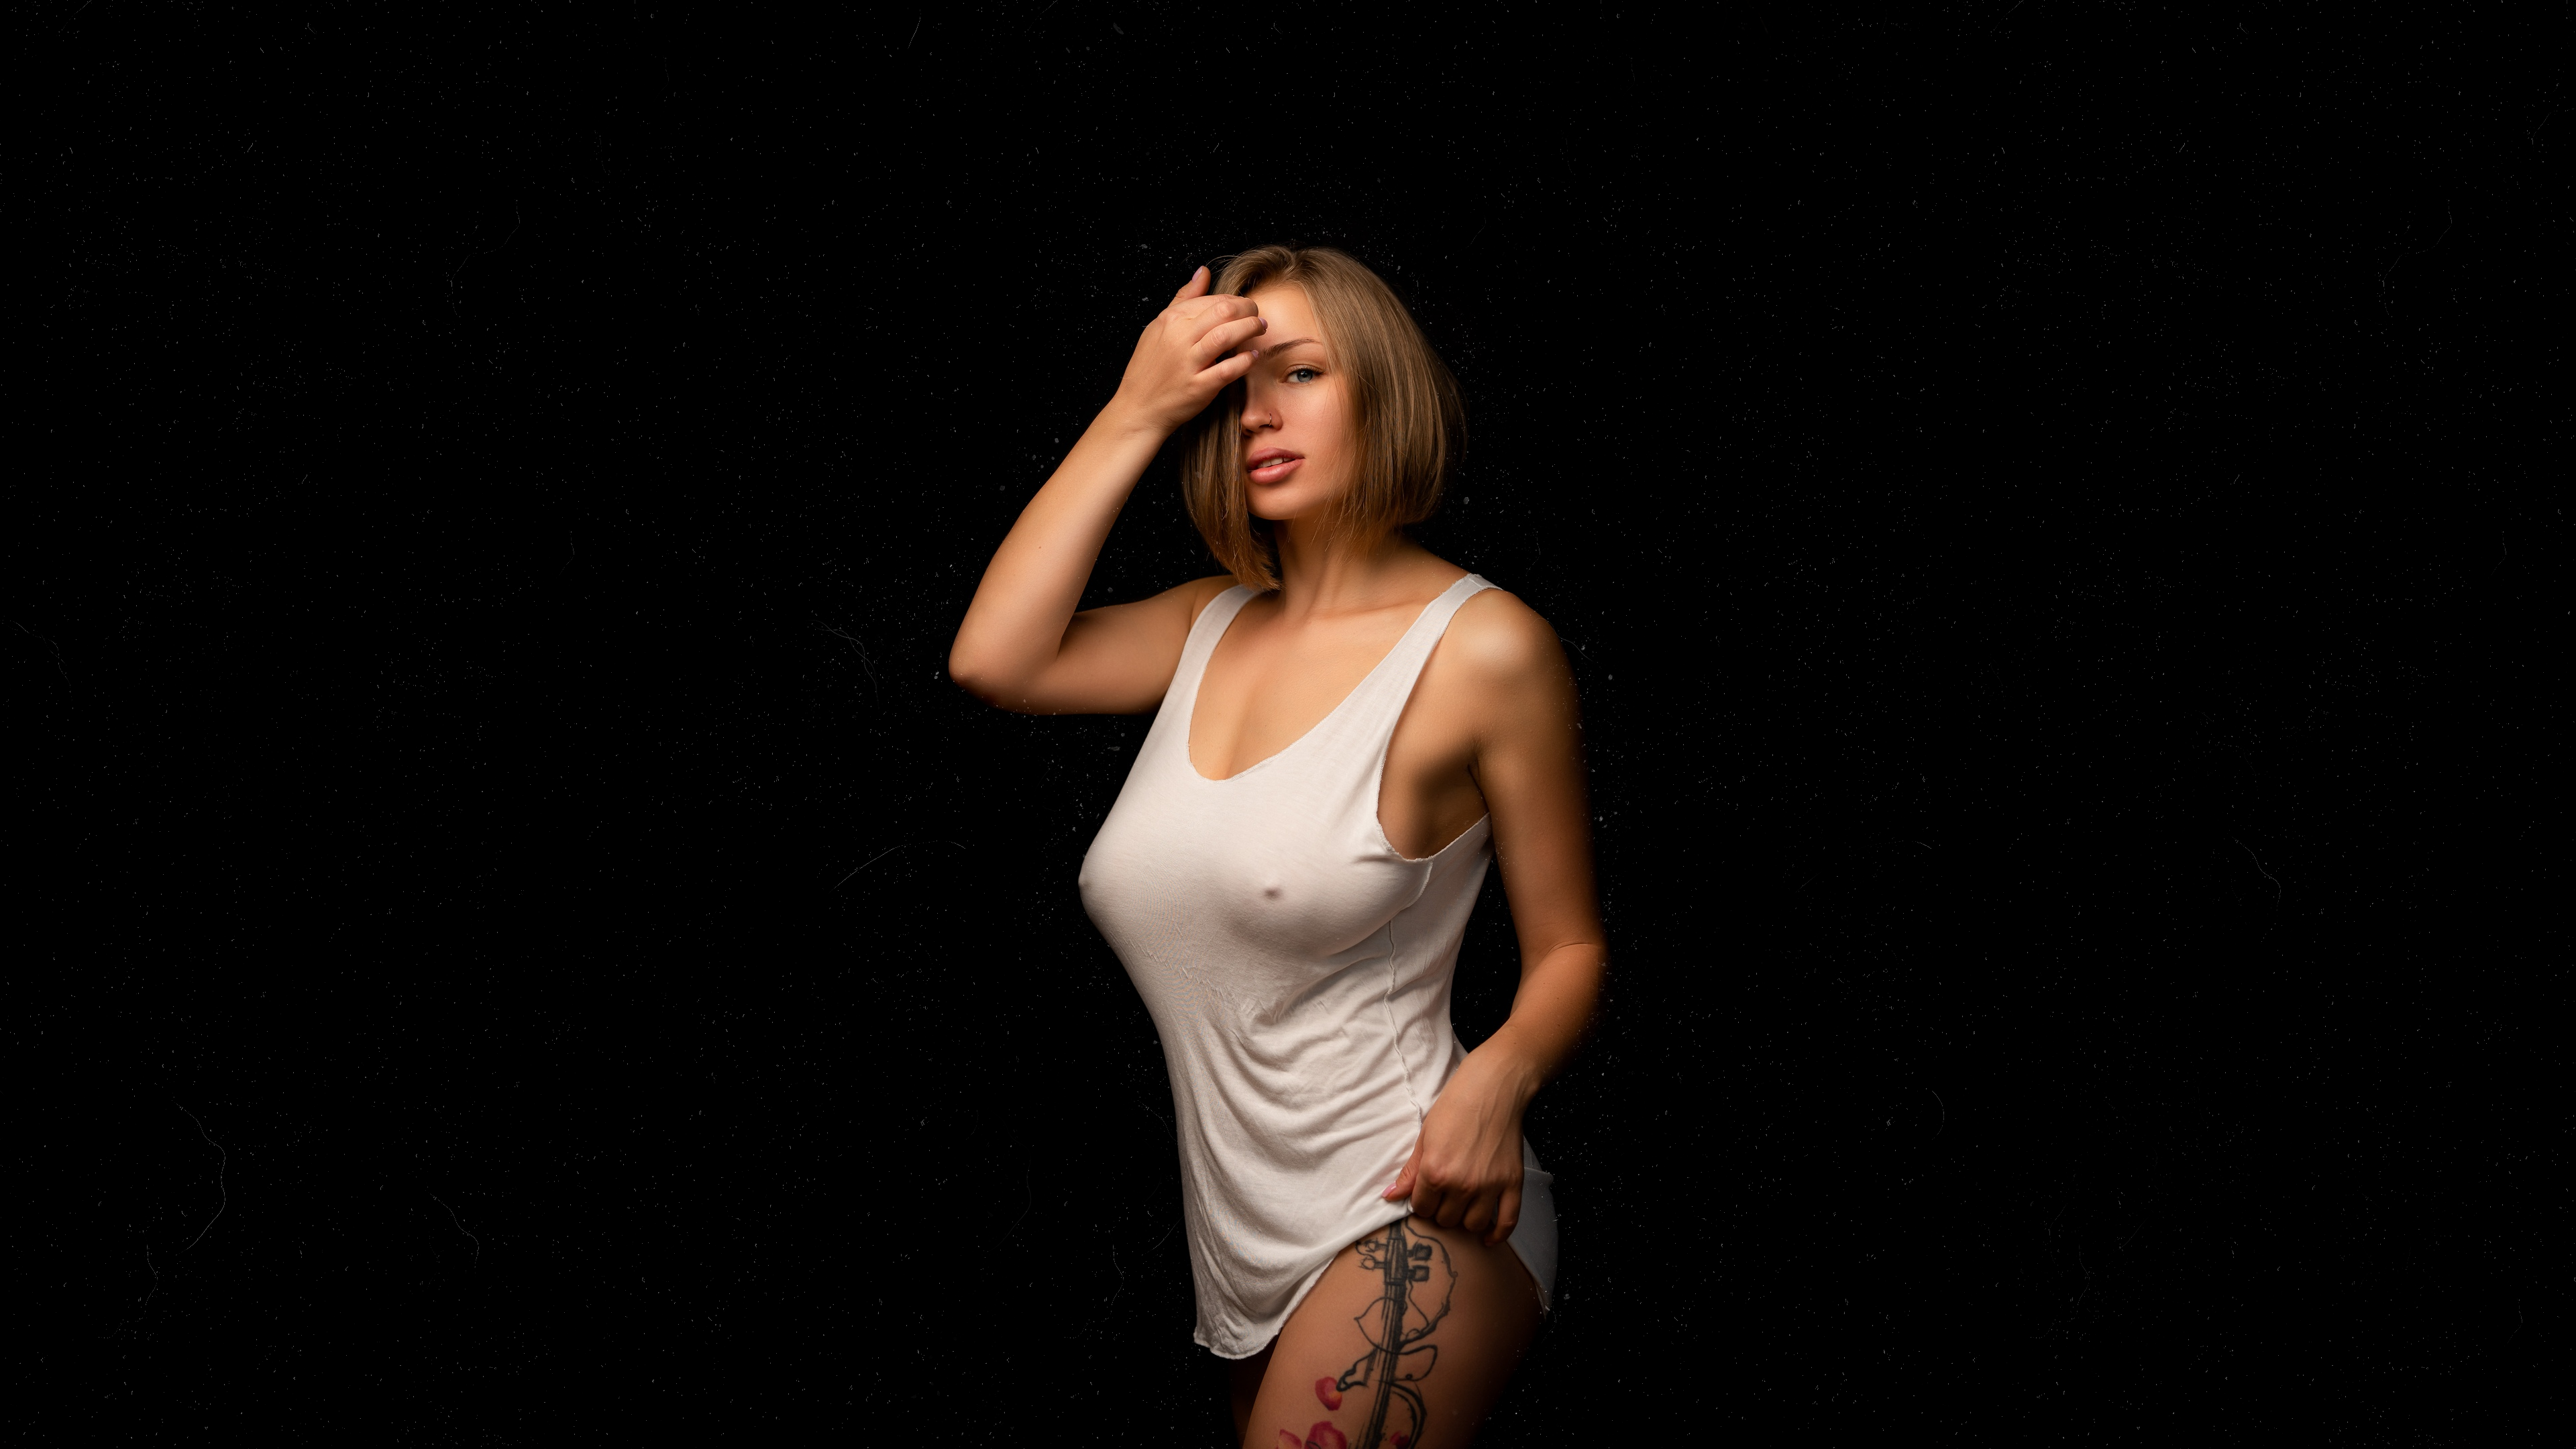 People 3840x2160 Anna Bykanova women model blonde looking at viewer gray eyes hair in face tank top cleavage no bra nipples through clothing nose rings tattoo inked girls portrait black background dust Ilya Pistoletov nipple bulge white tops